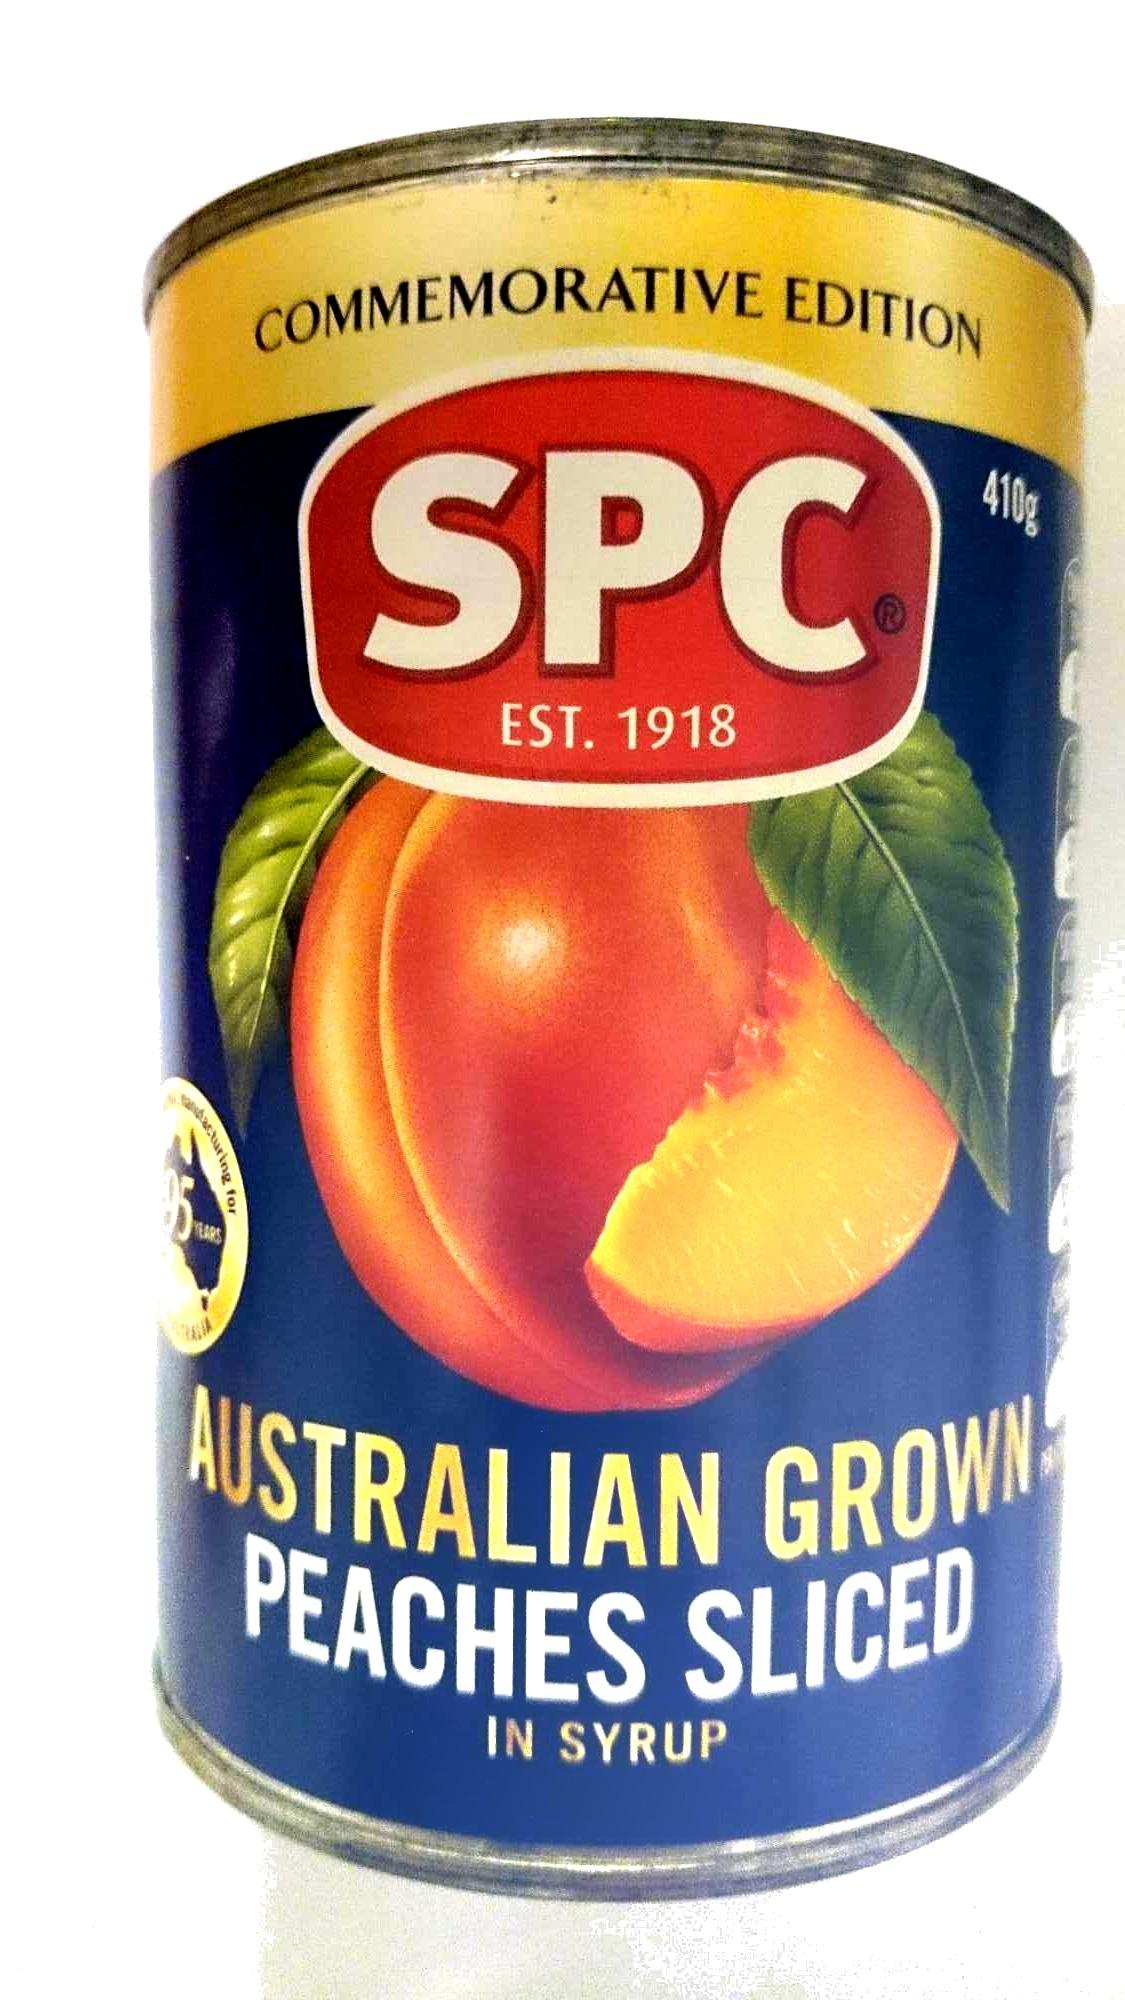 Australian Grown Peaches Sliced in Syrup - Produit - en